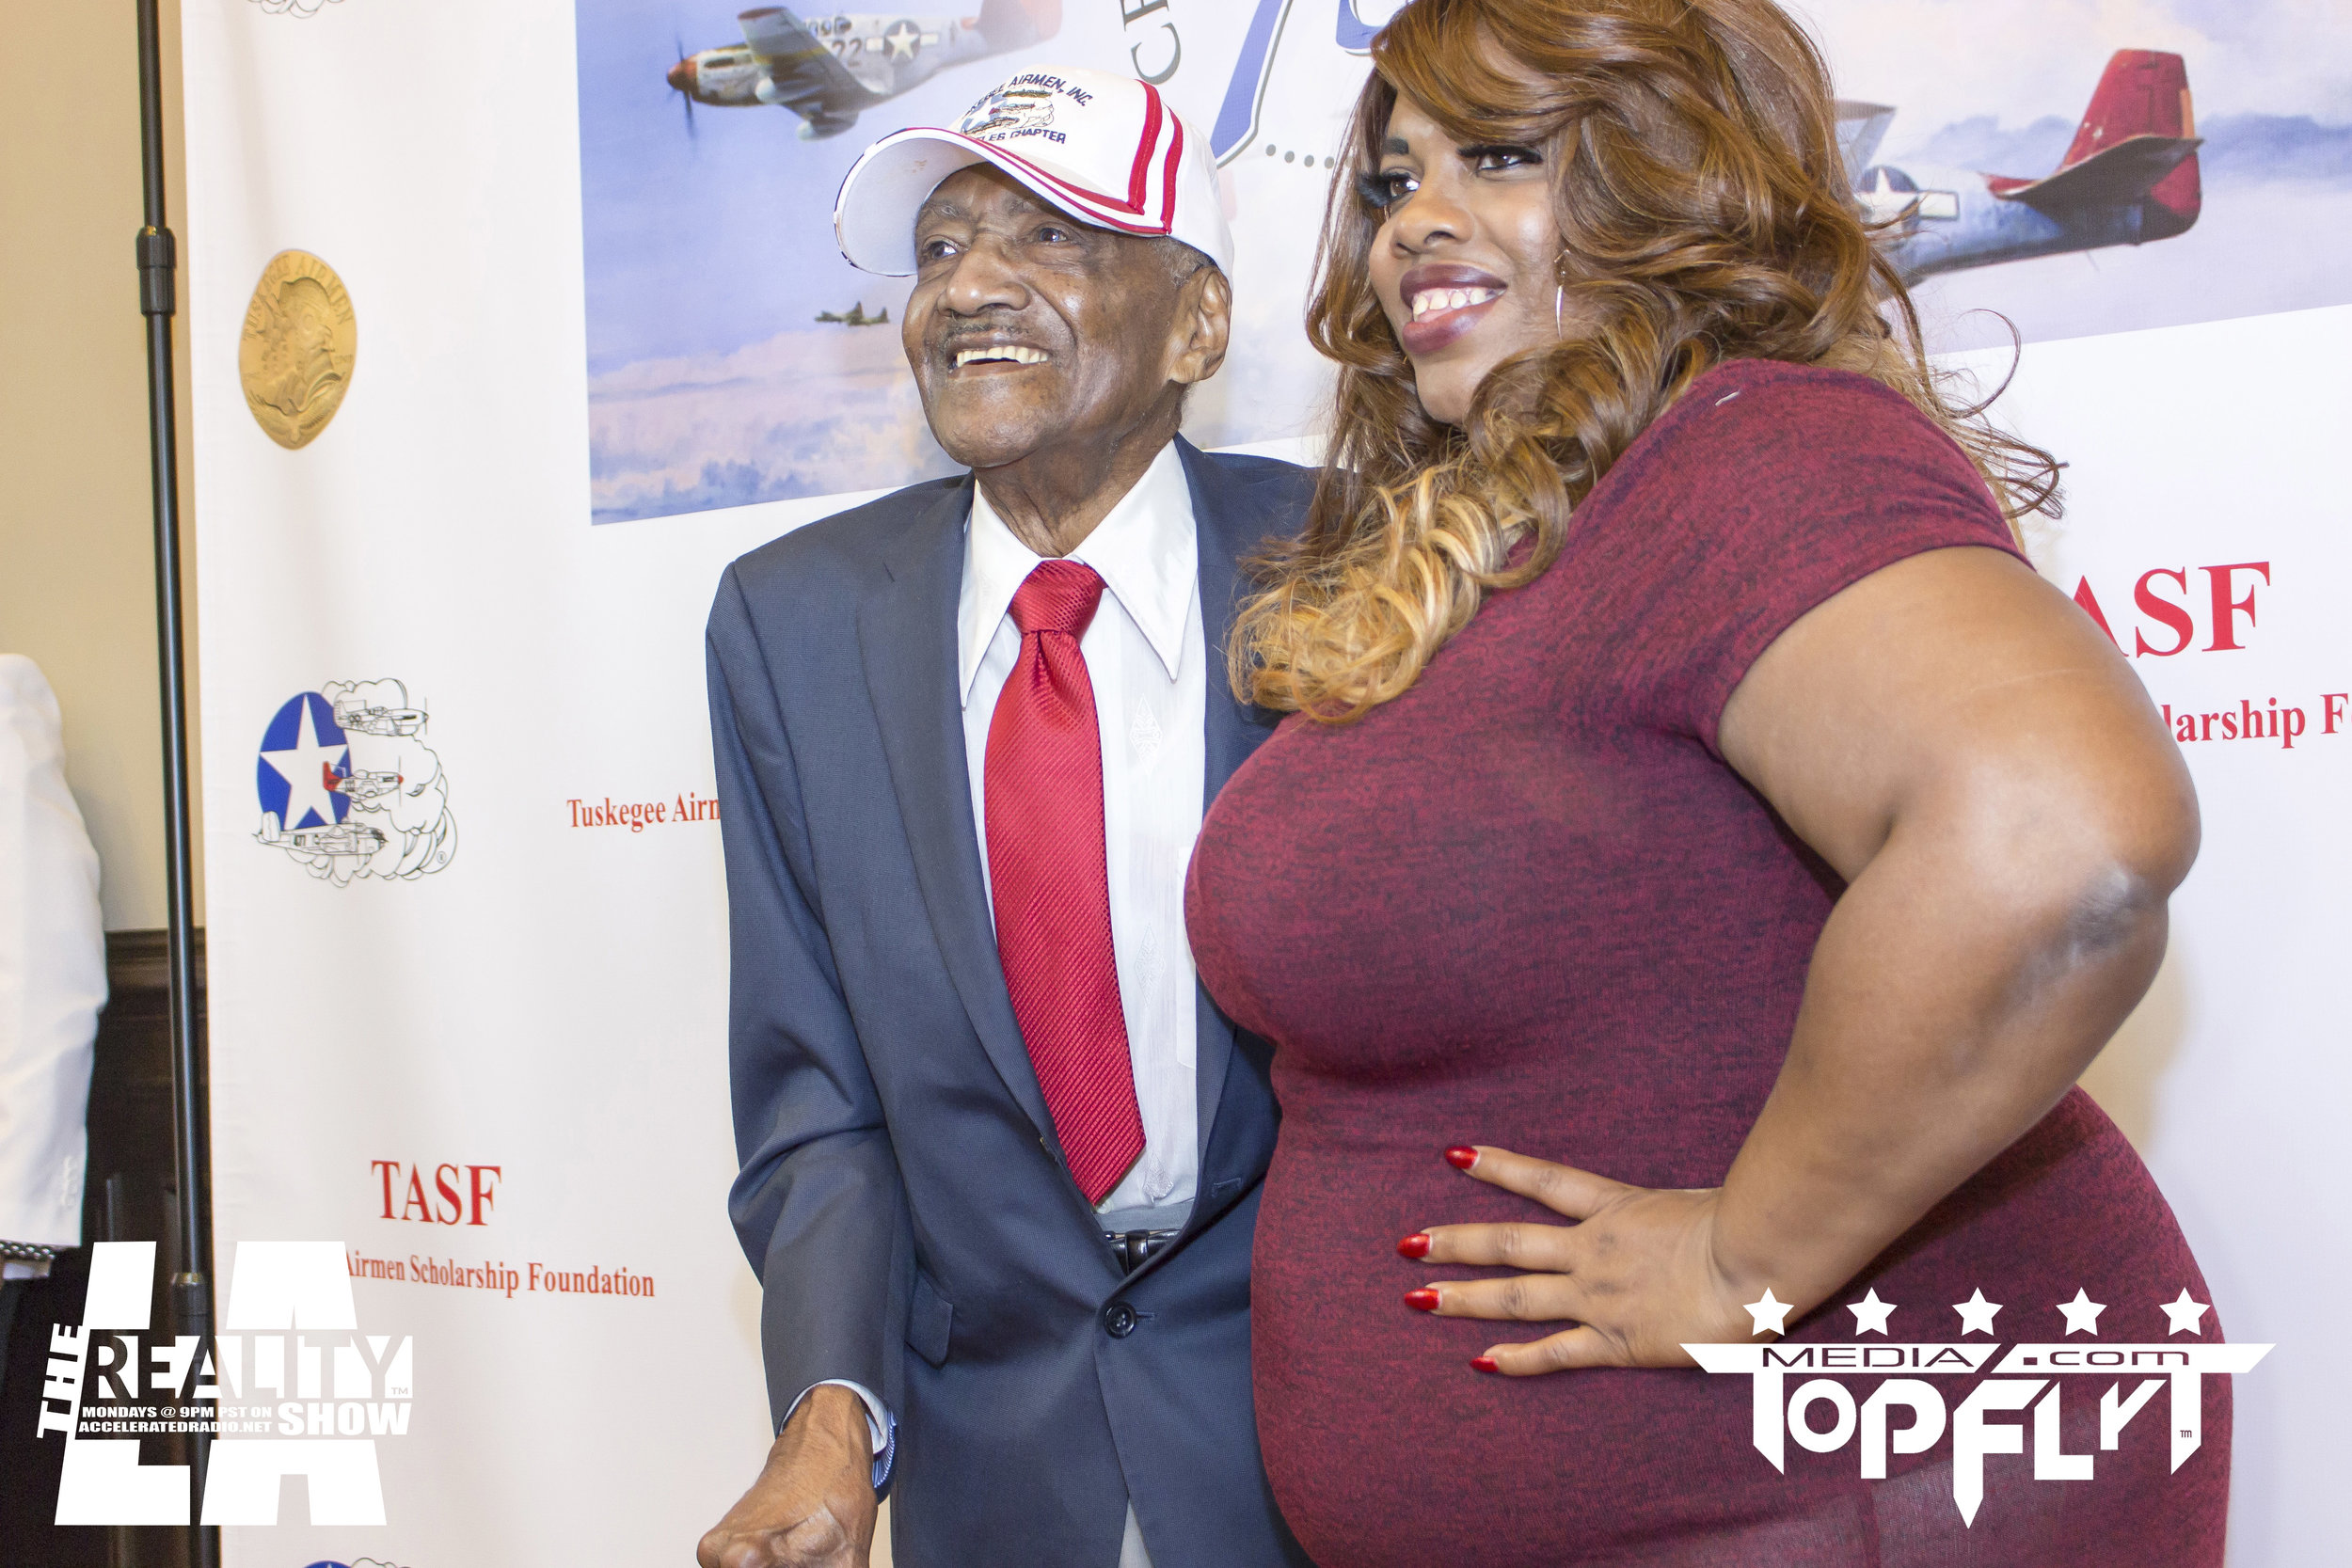 The Reality Show LA - Tuskegee Airmen 75th Anniversary VIP Reception_14.jpg